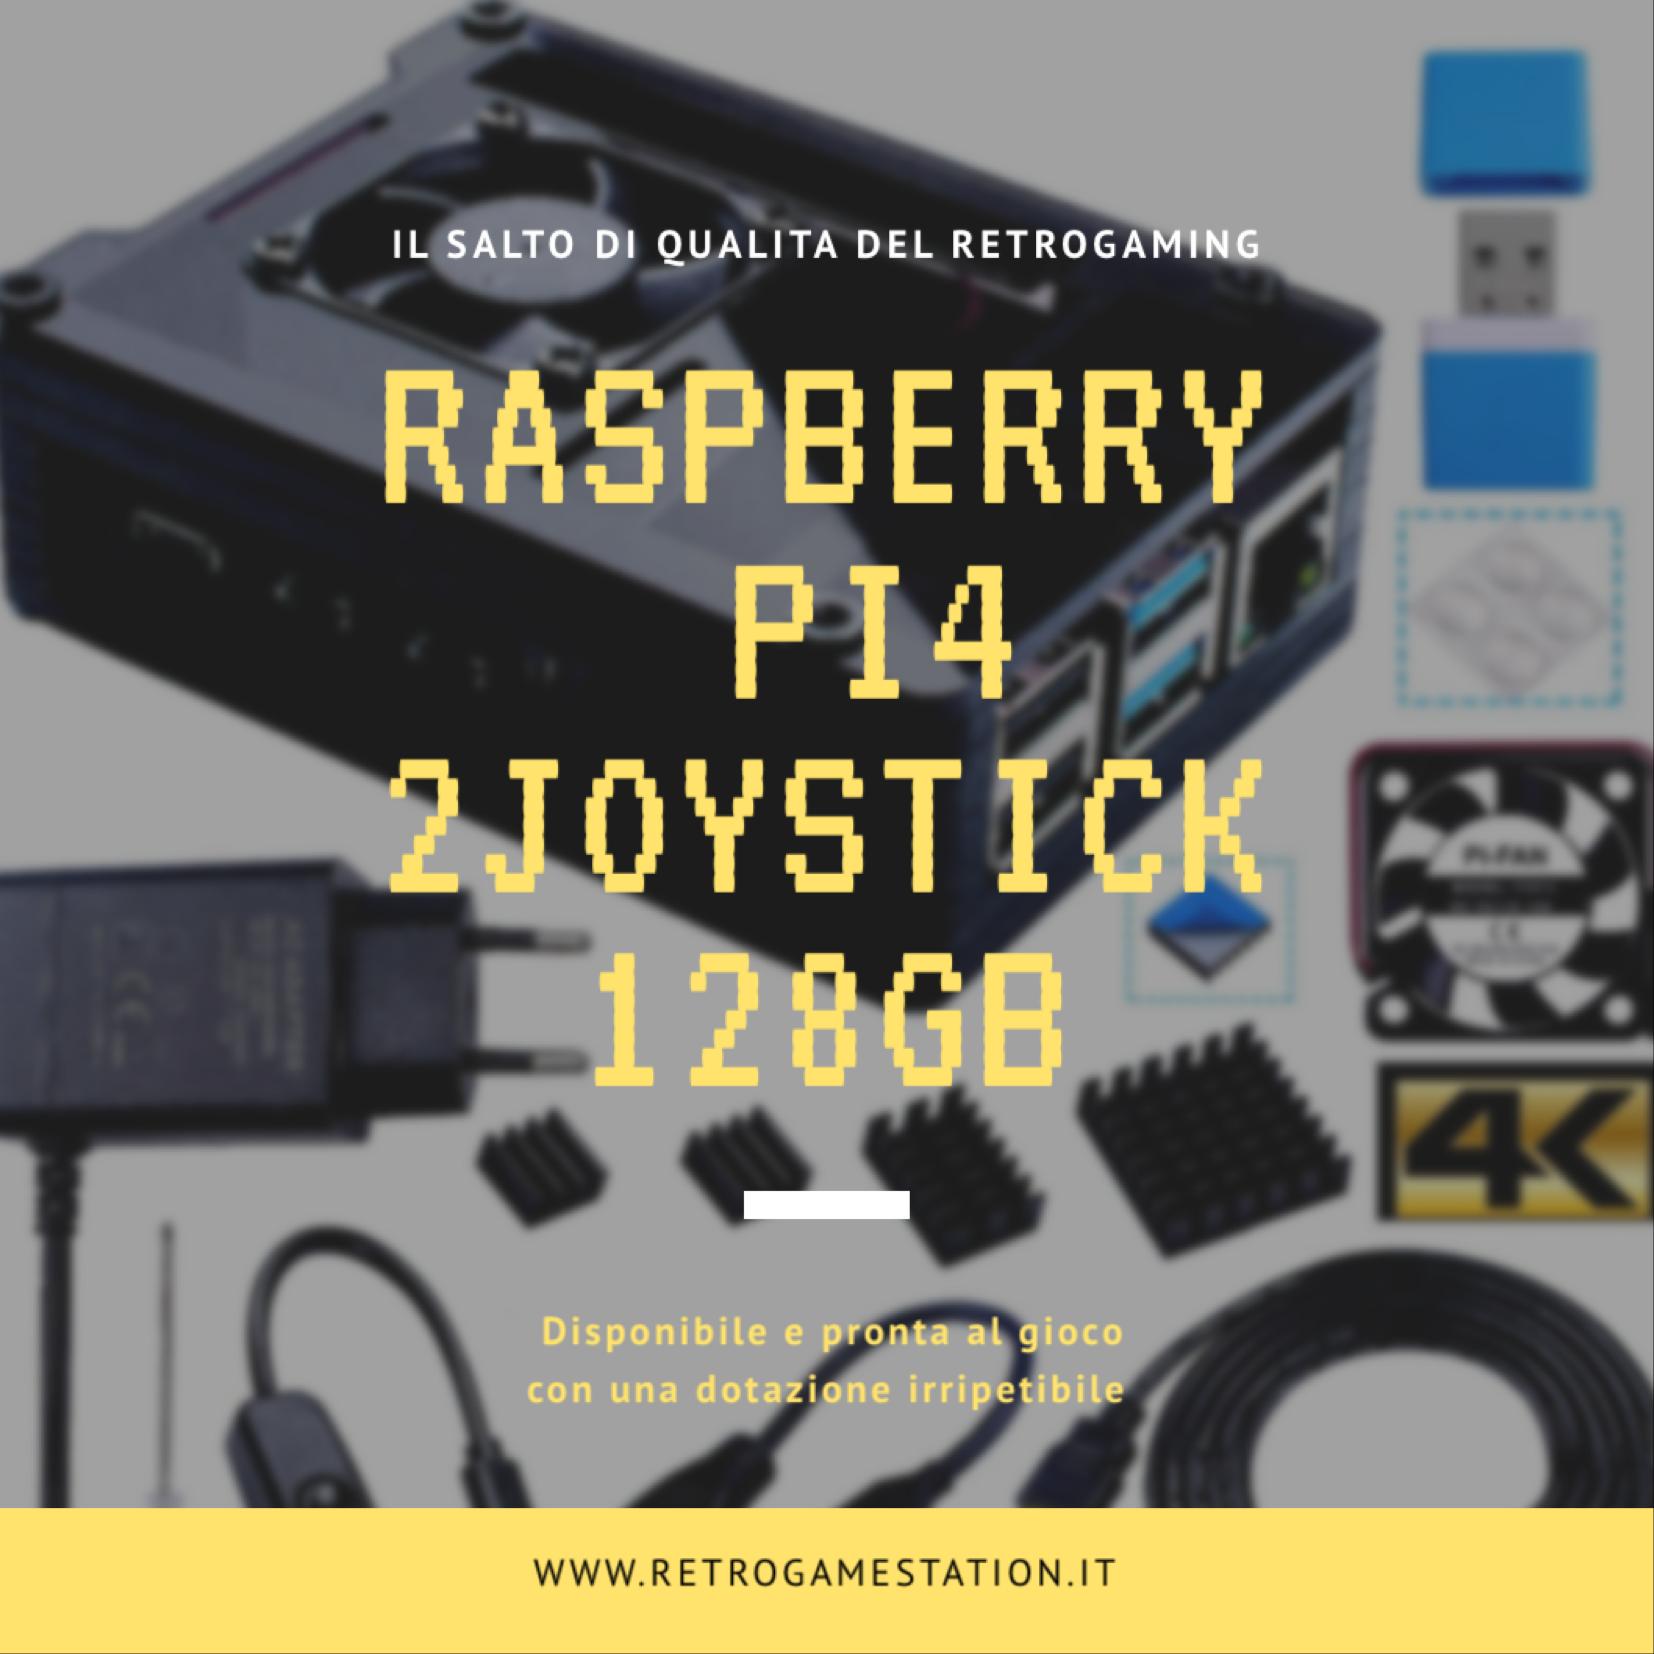 Console Kit Raspberry Pi 4